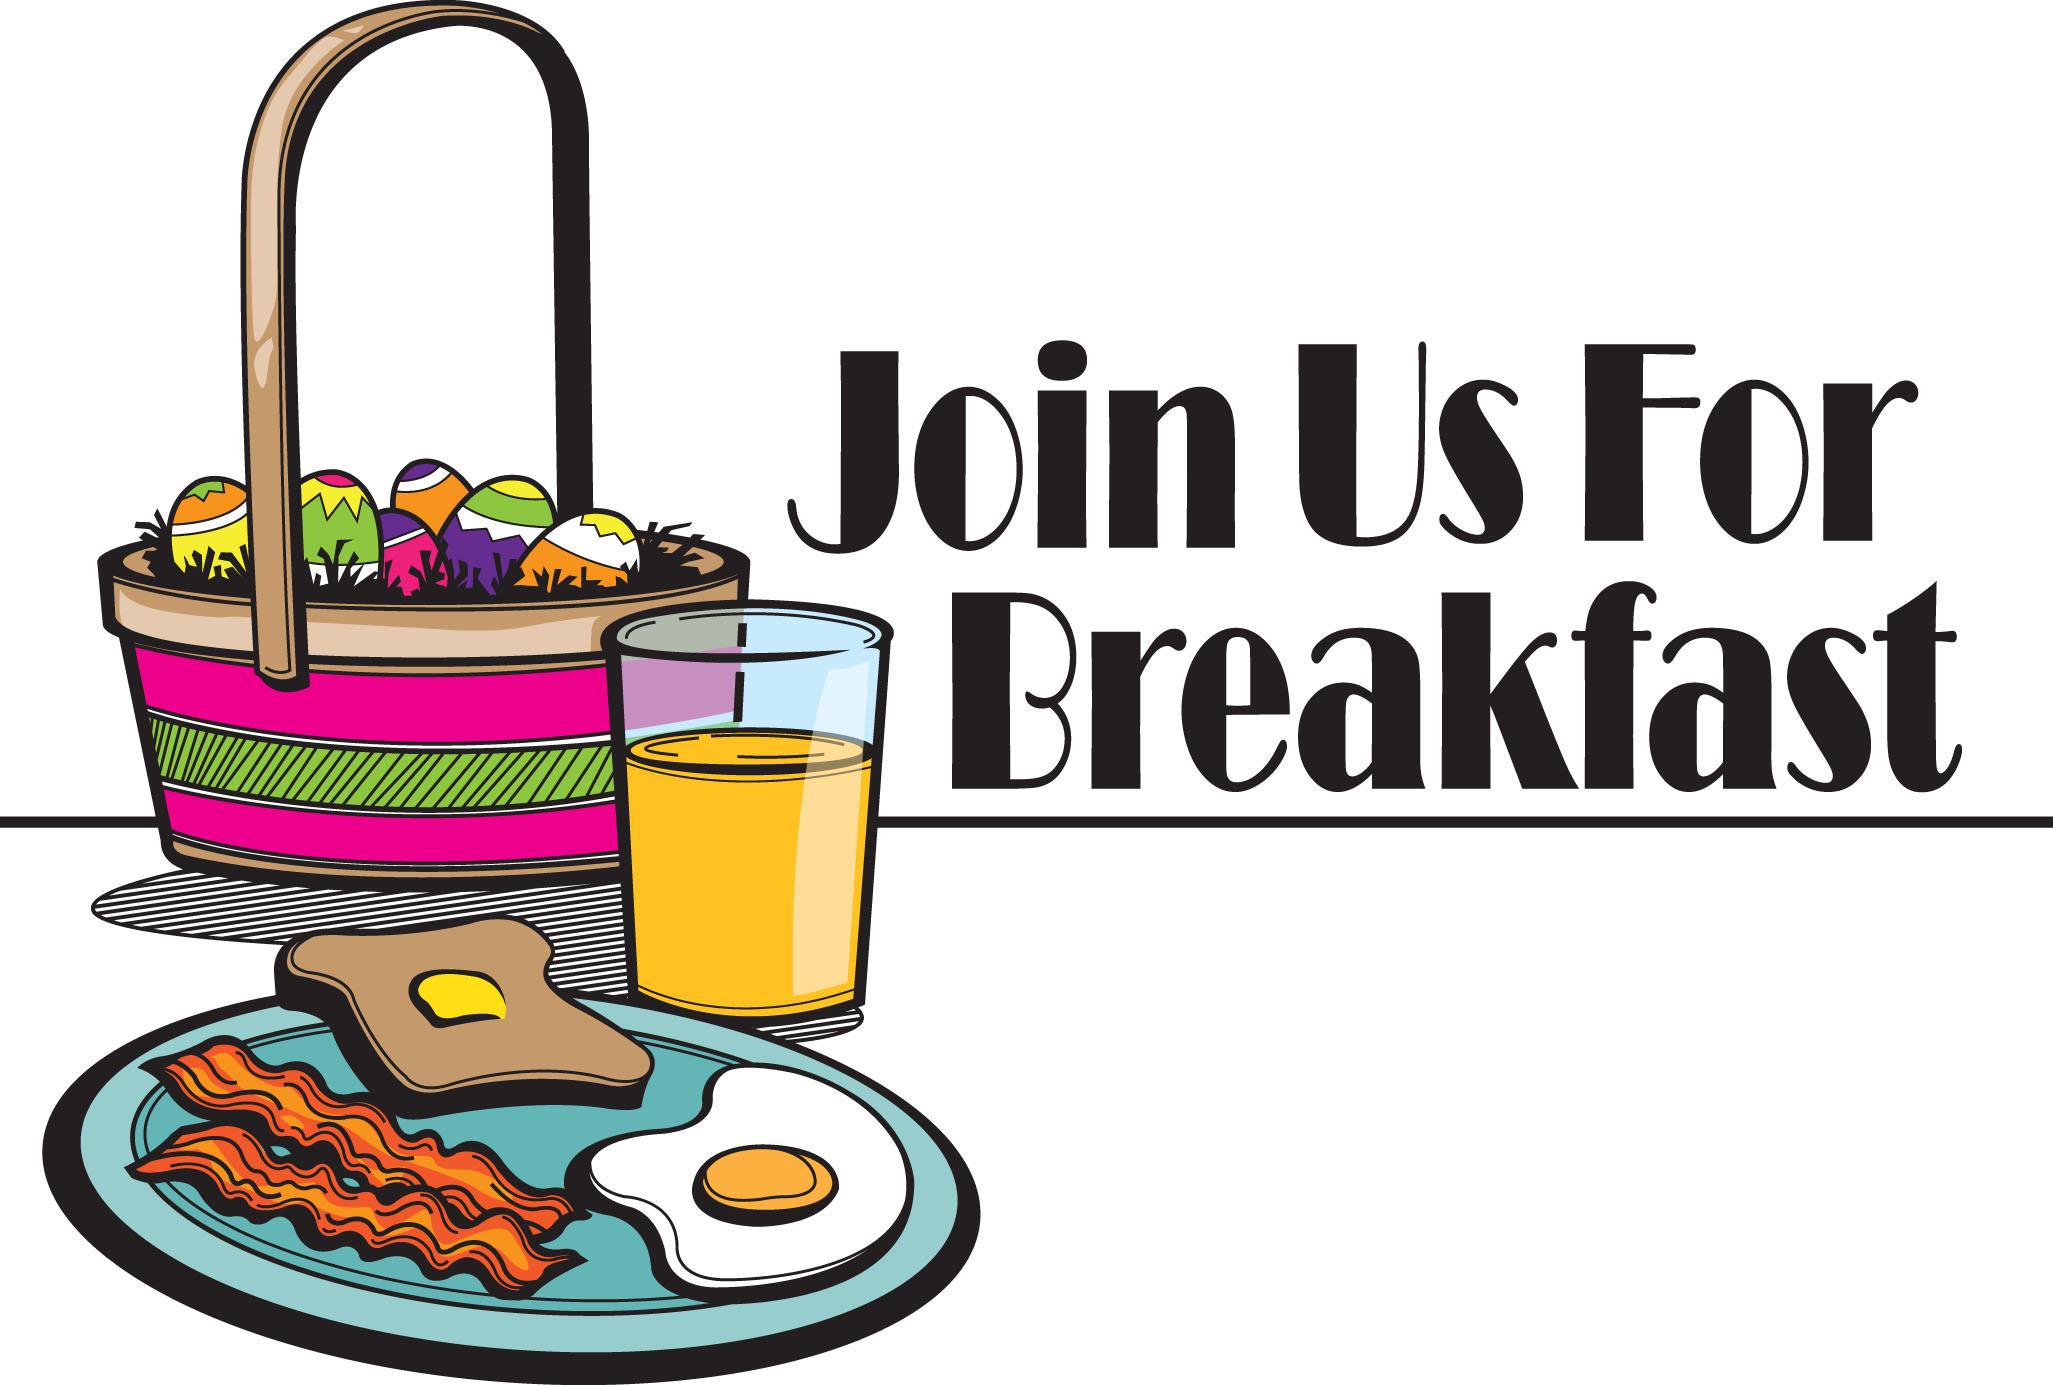 Church Breakfast Clipart.